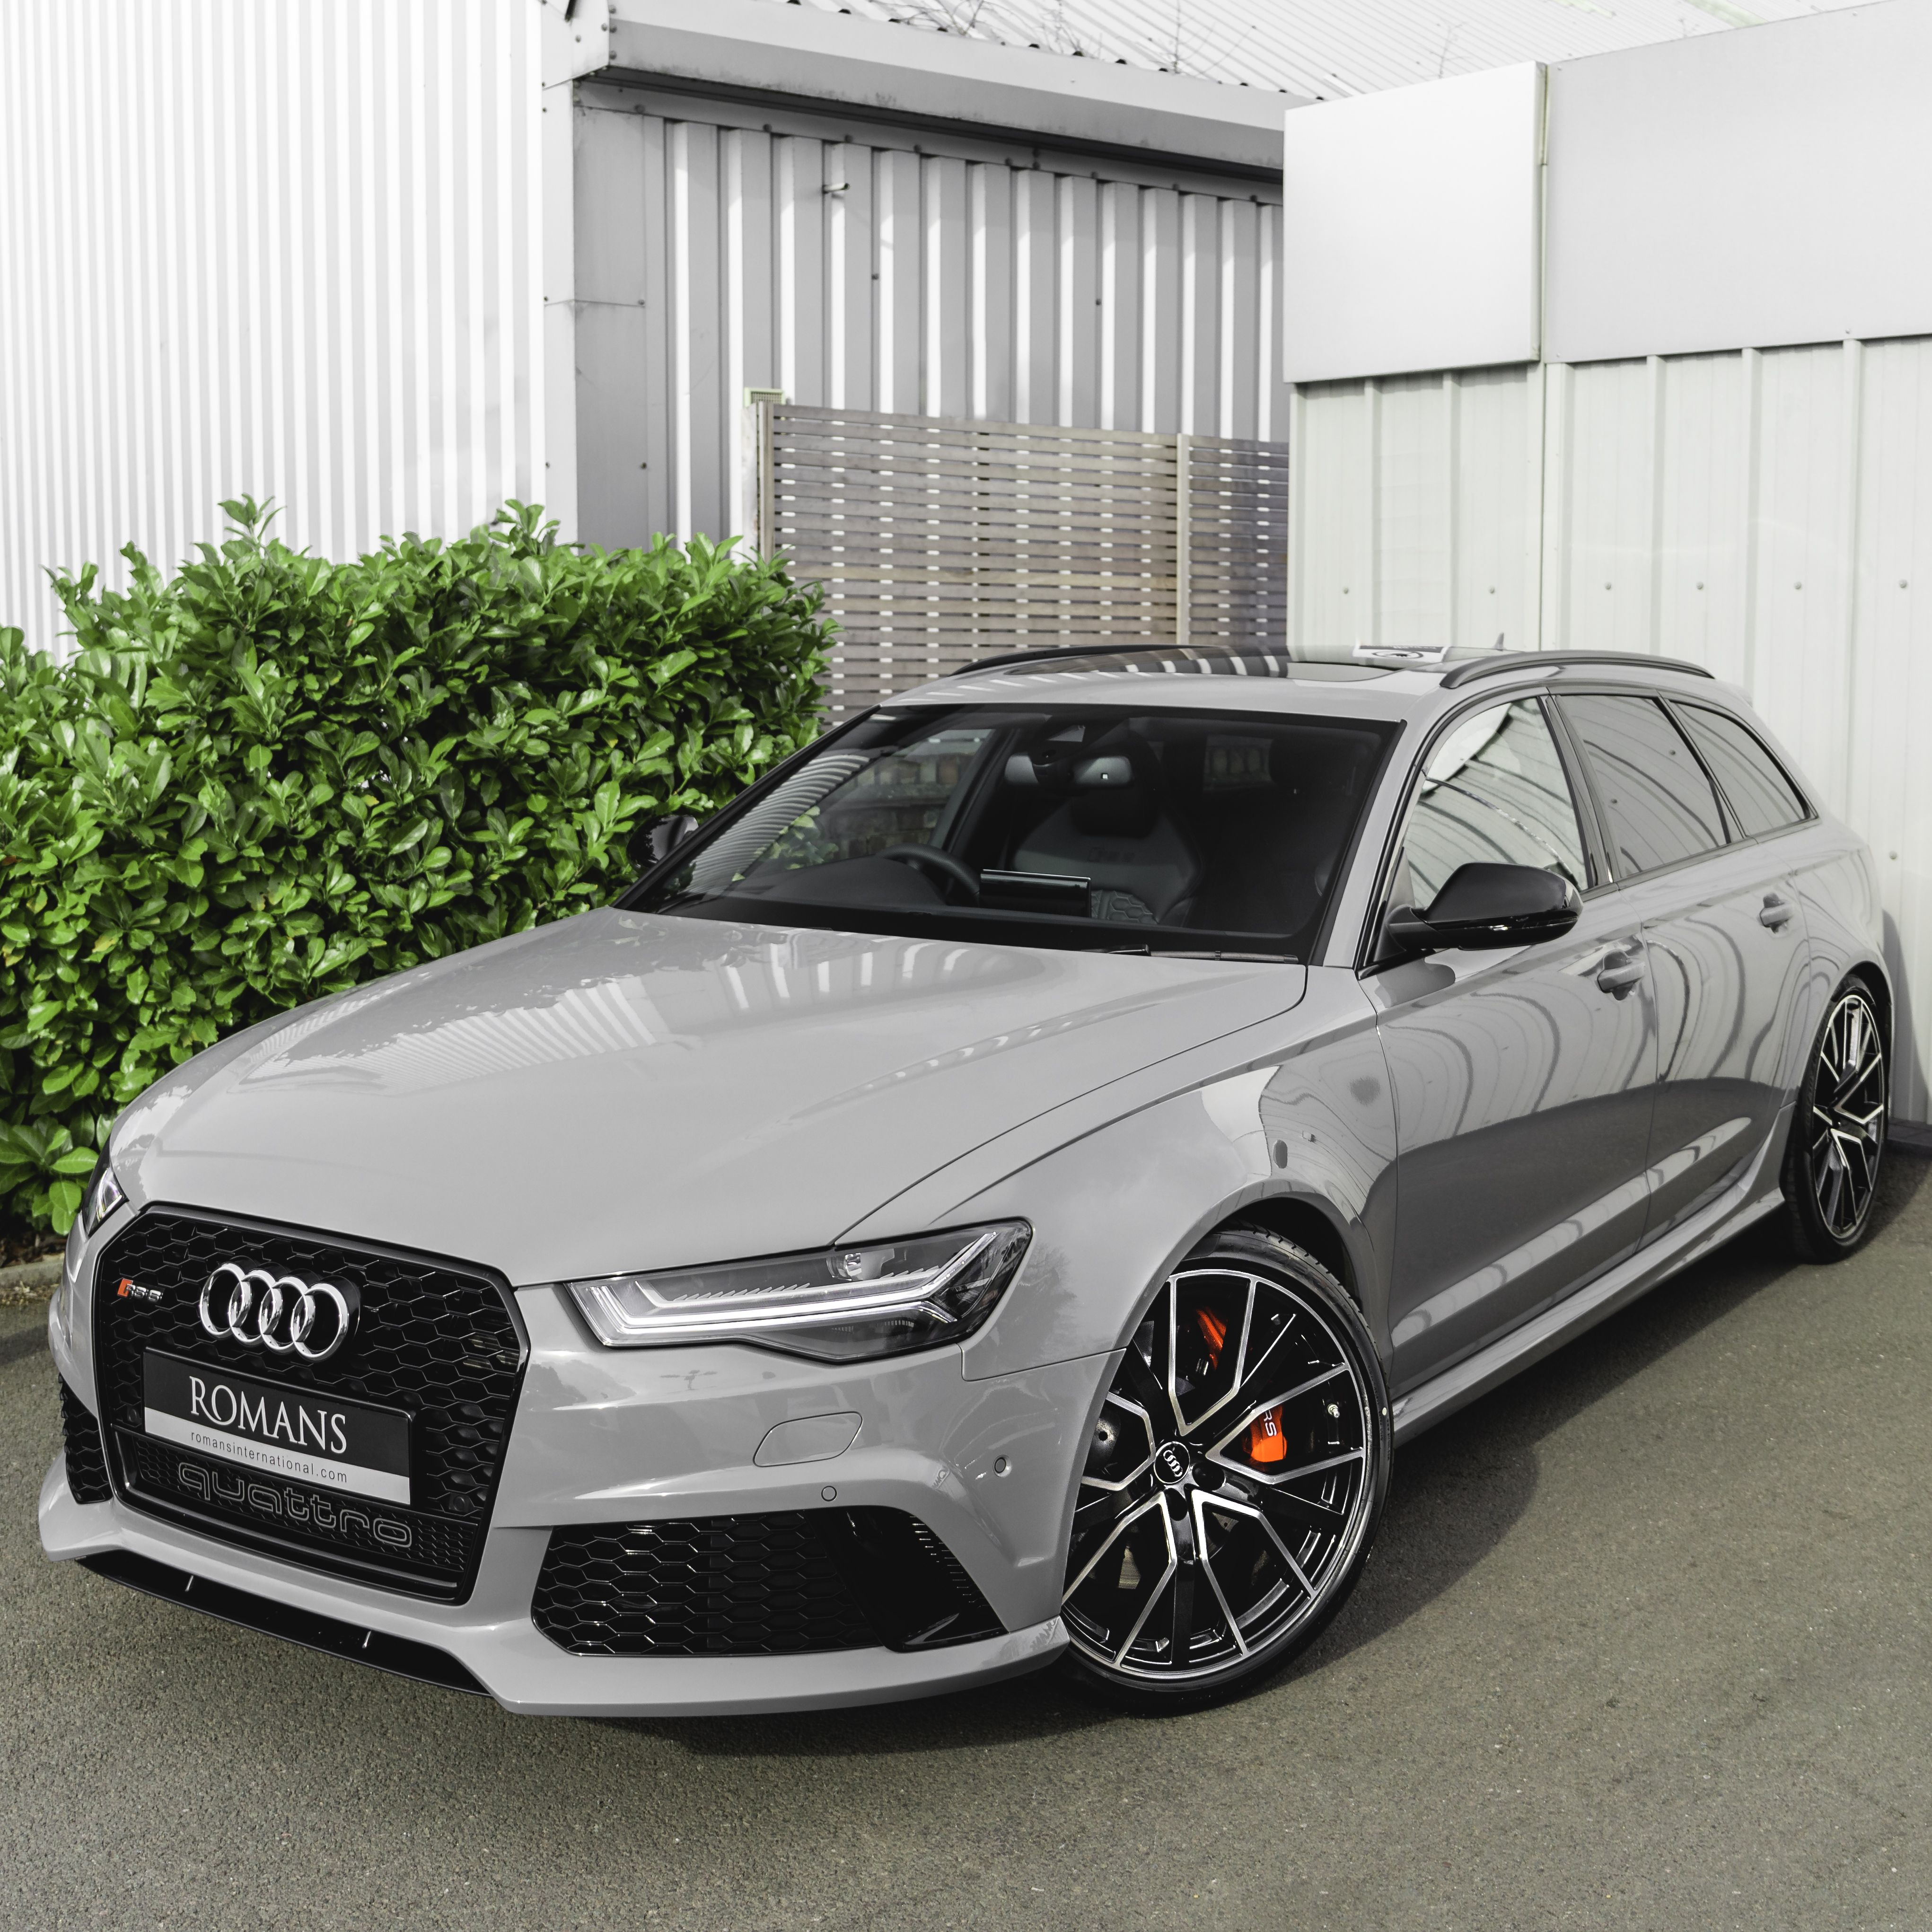 2018 Used Audi A6 Rs6 Plus Avant Tfsi Quattro